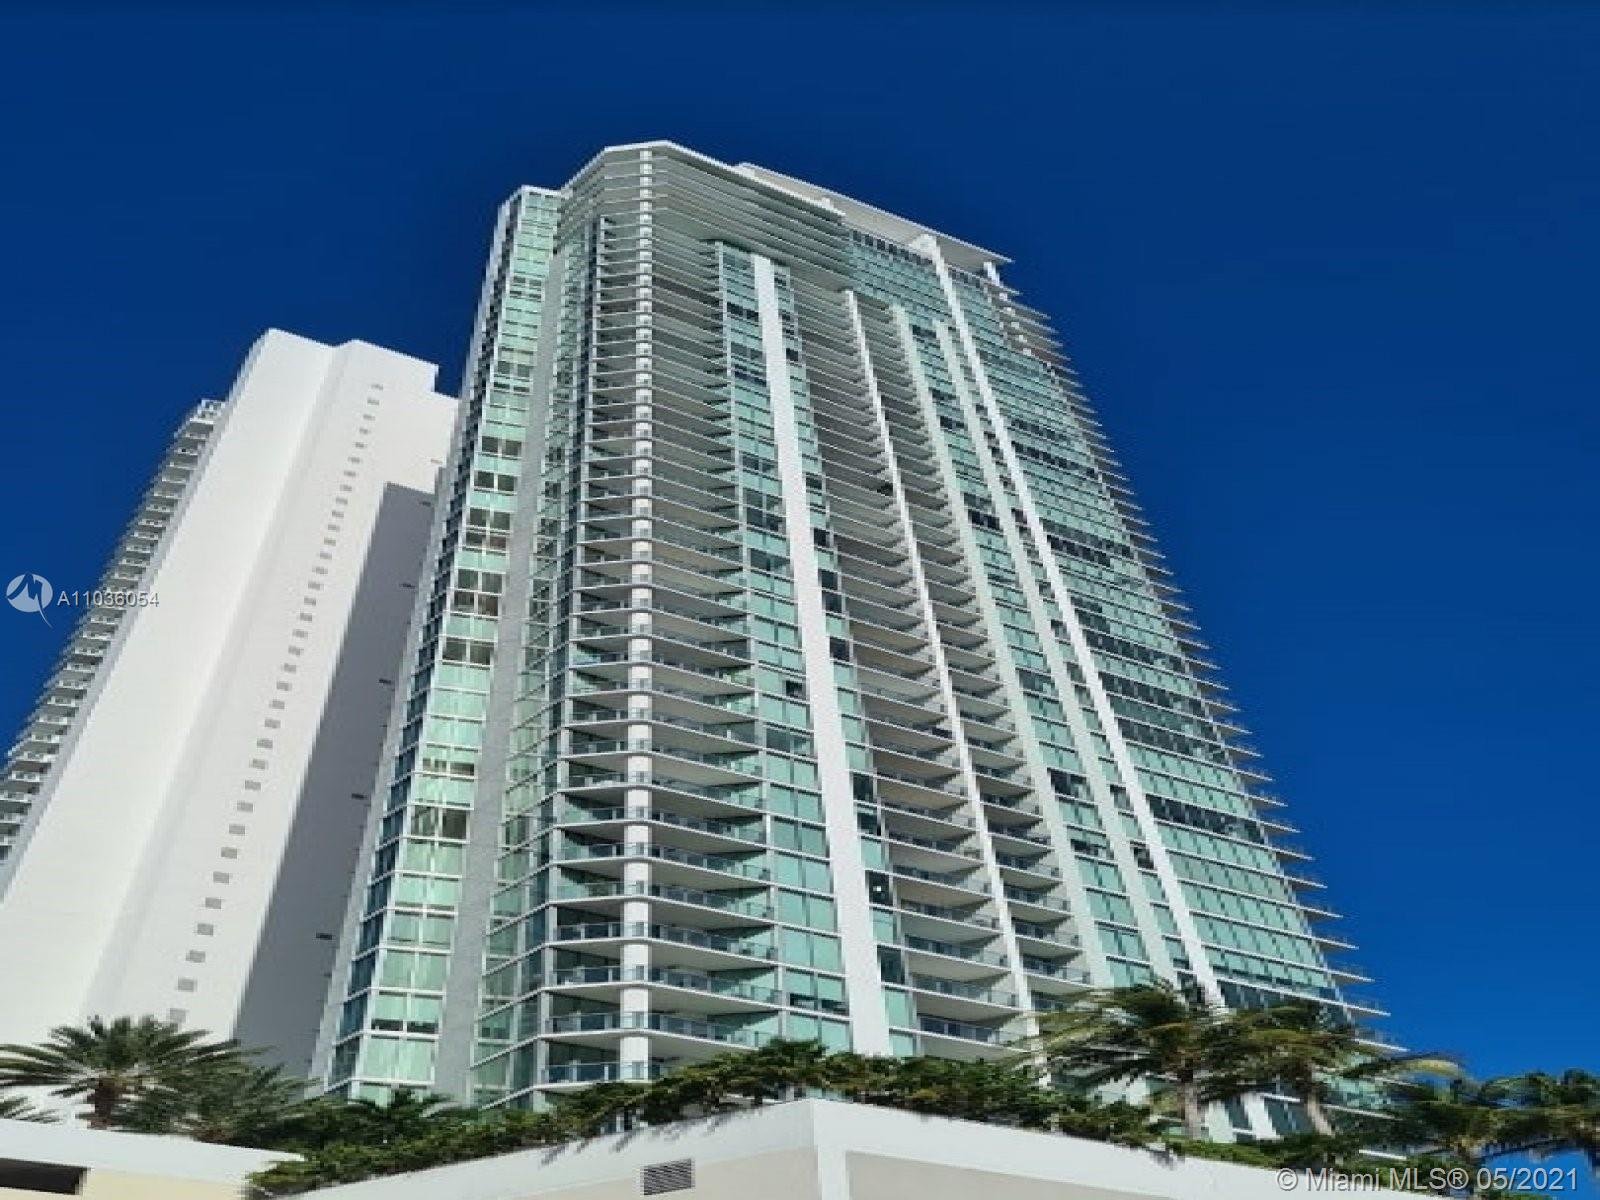 Biscayne Beach #301 - 2900 NE 7th Ave #301, Miami, FL 33137